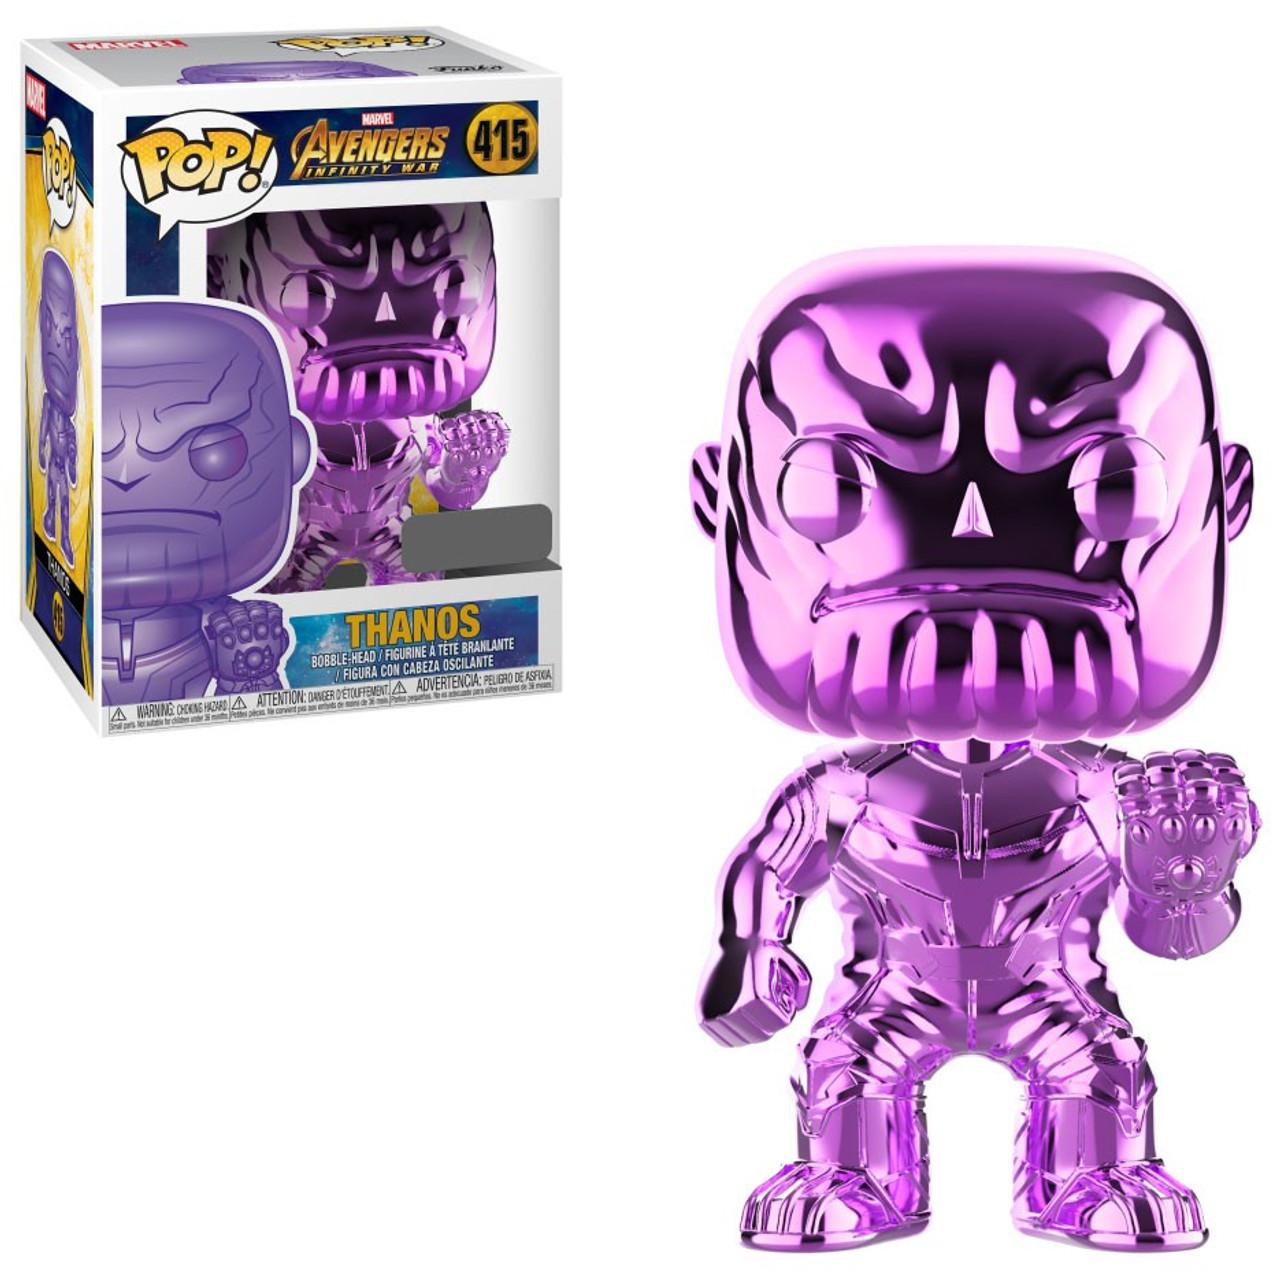 Excellent Condition Chrome Thanos Set Marvel Funko Pop